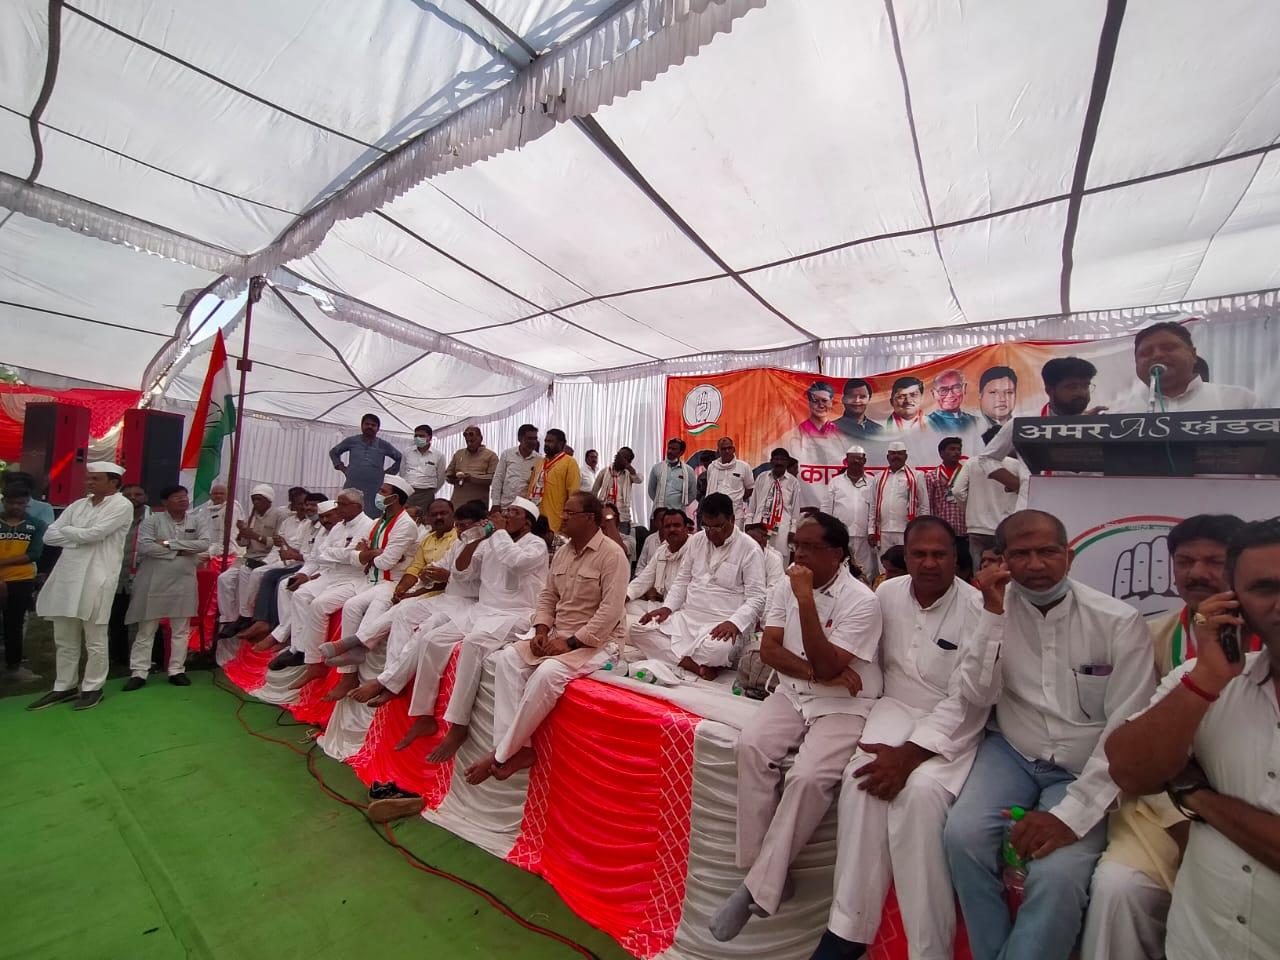 एकजुटता दिखाने एक मंच पर अरुण, शेरा, जीत का दिलाया संकल्प' राजनारायण बोले : सिंगाजी महाराज की आवाज संसद तक पहुंचा दो|खंडवा,Khandwa - Dainik Bhaskar